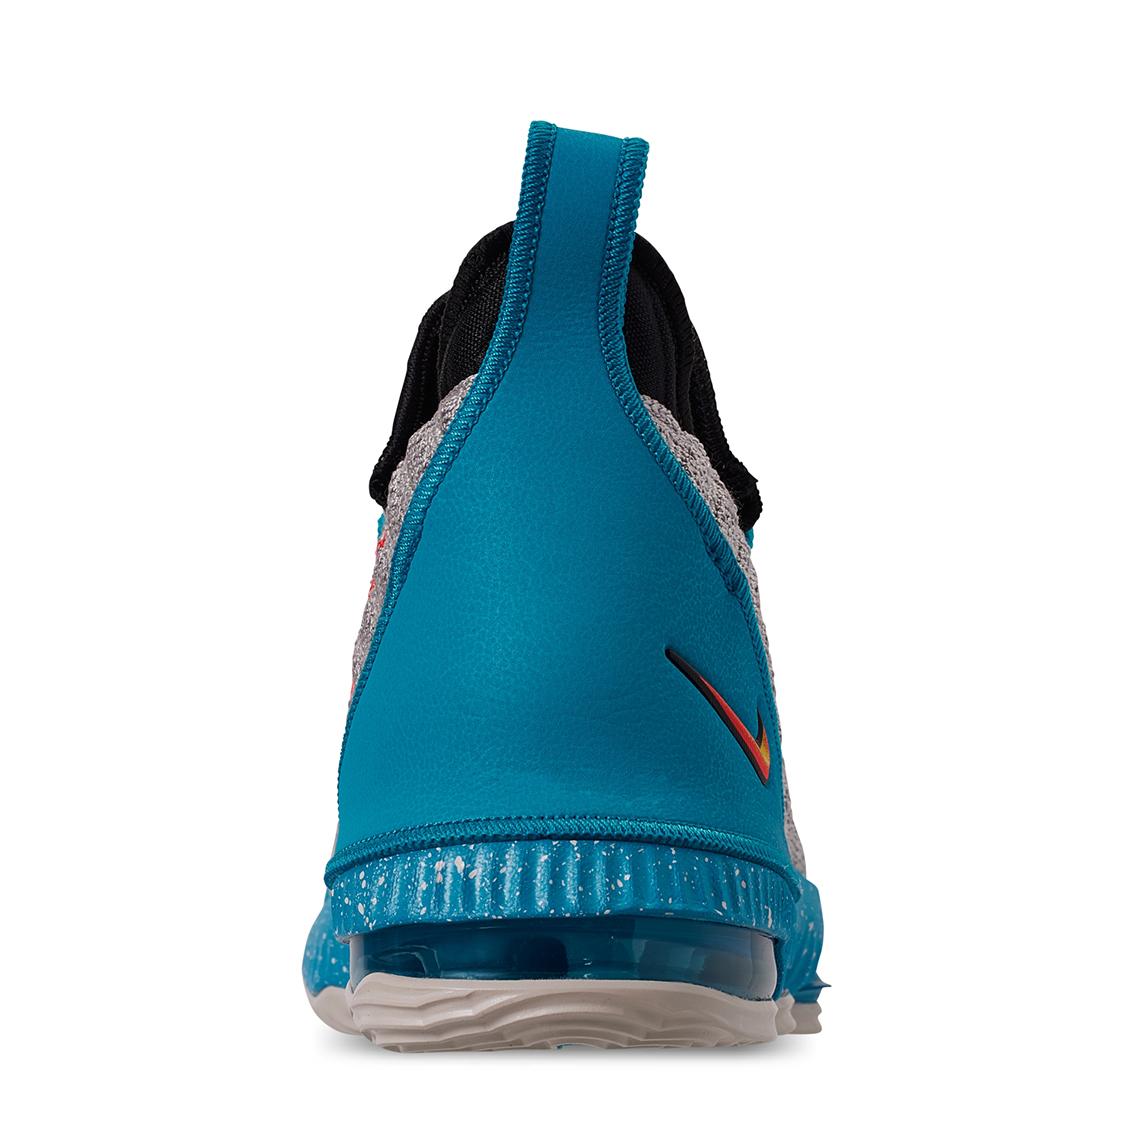 1e171987b7b597 Nike LeBron 16 Kids South Beach AQ2465-076 Release Date ...